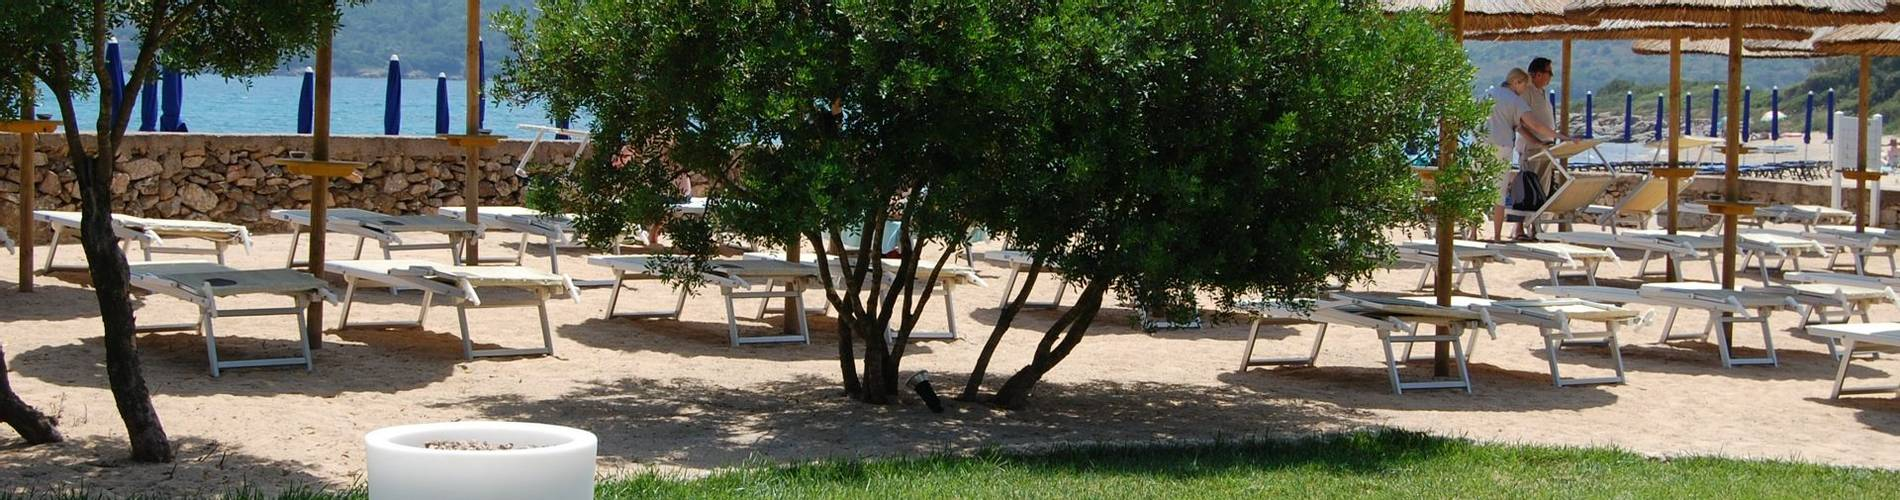 Le Saline, Sardinia, Italy (4).JPG